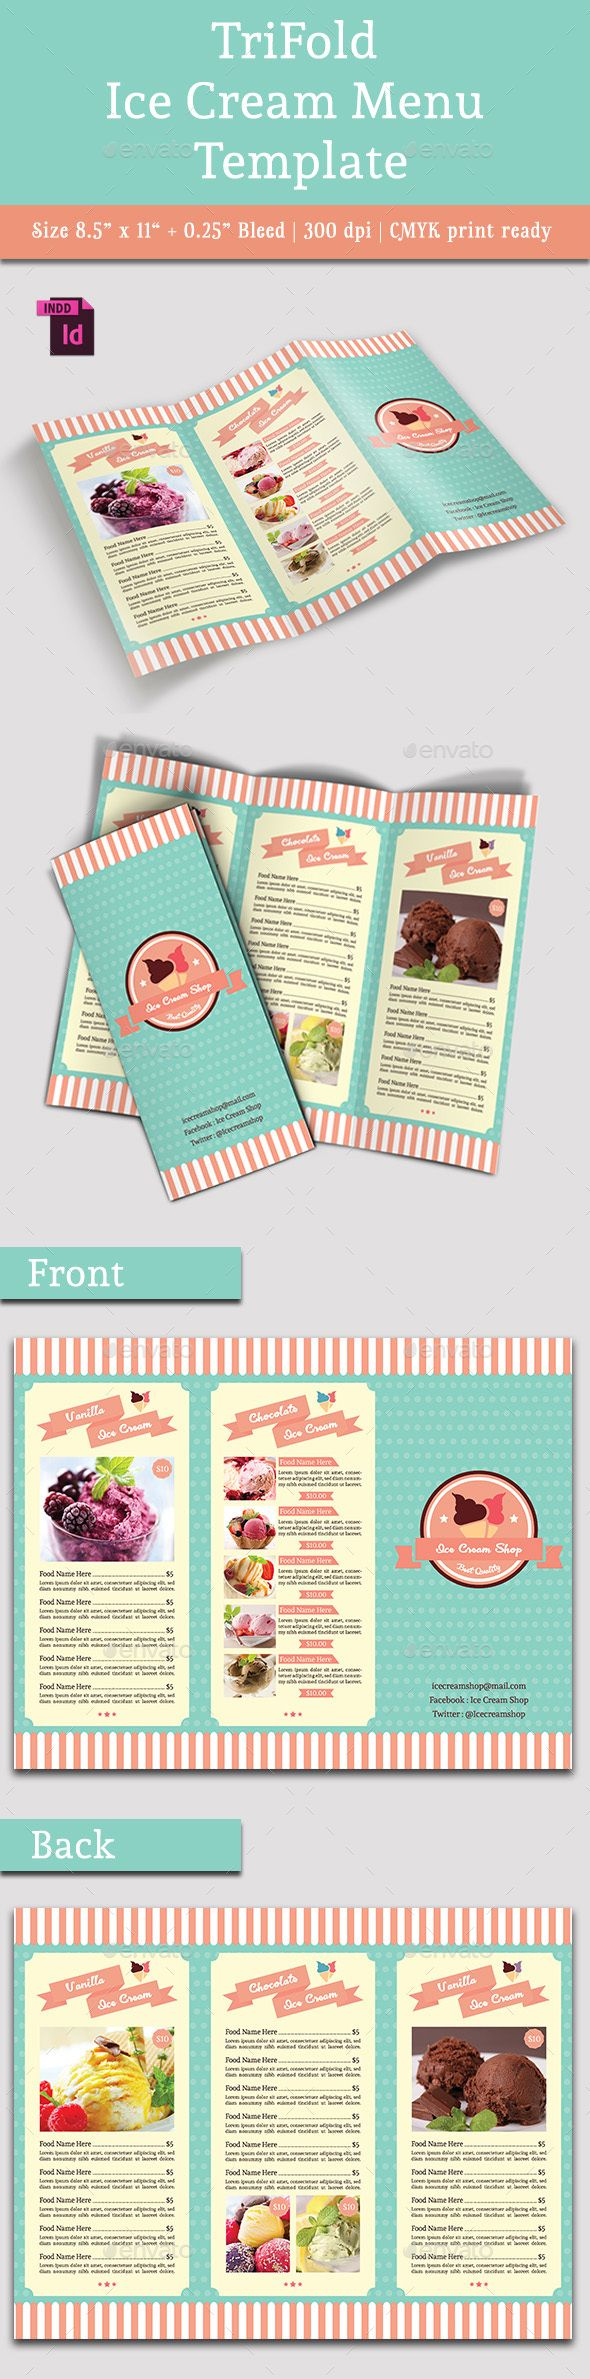 TriFold Ice Cream Menu Template #design Download: http://graphicriver.net/item/trifold-ice-cream-menu-template-vol-2/13064294?ref=ksioks